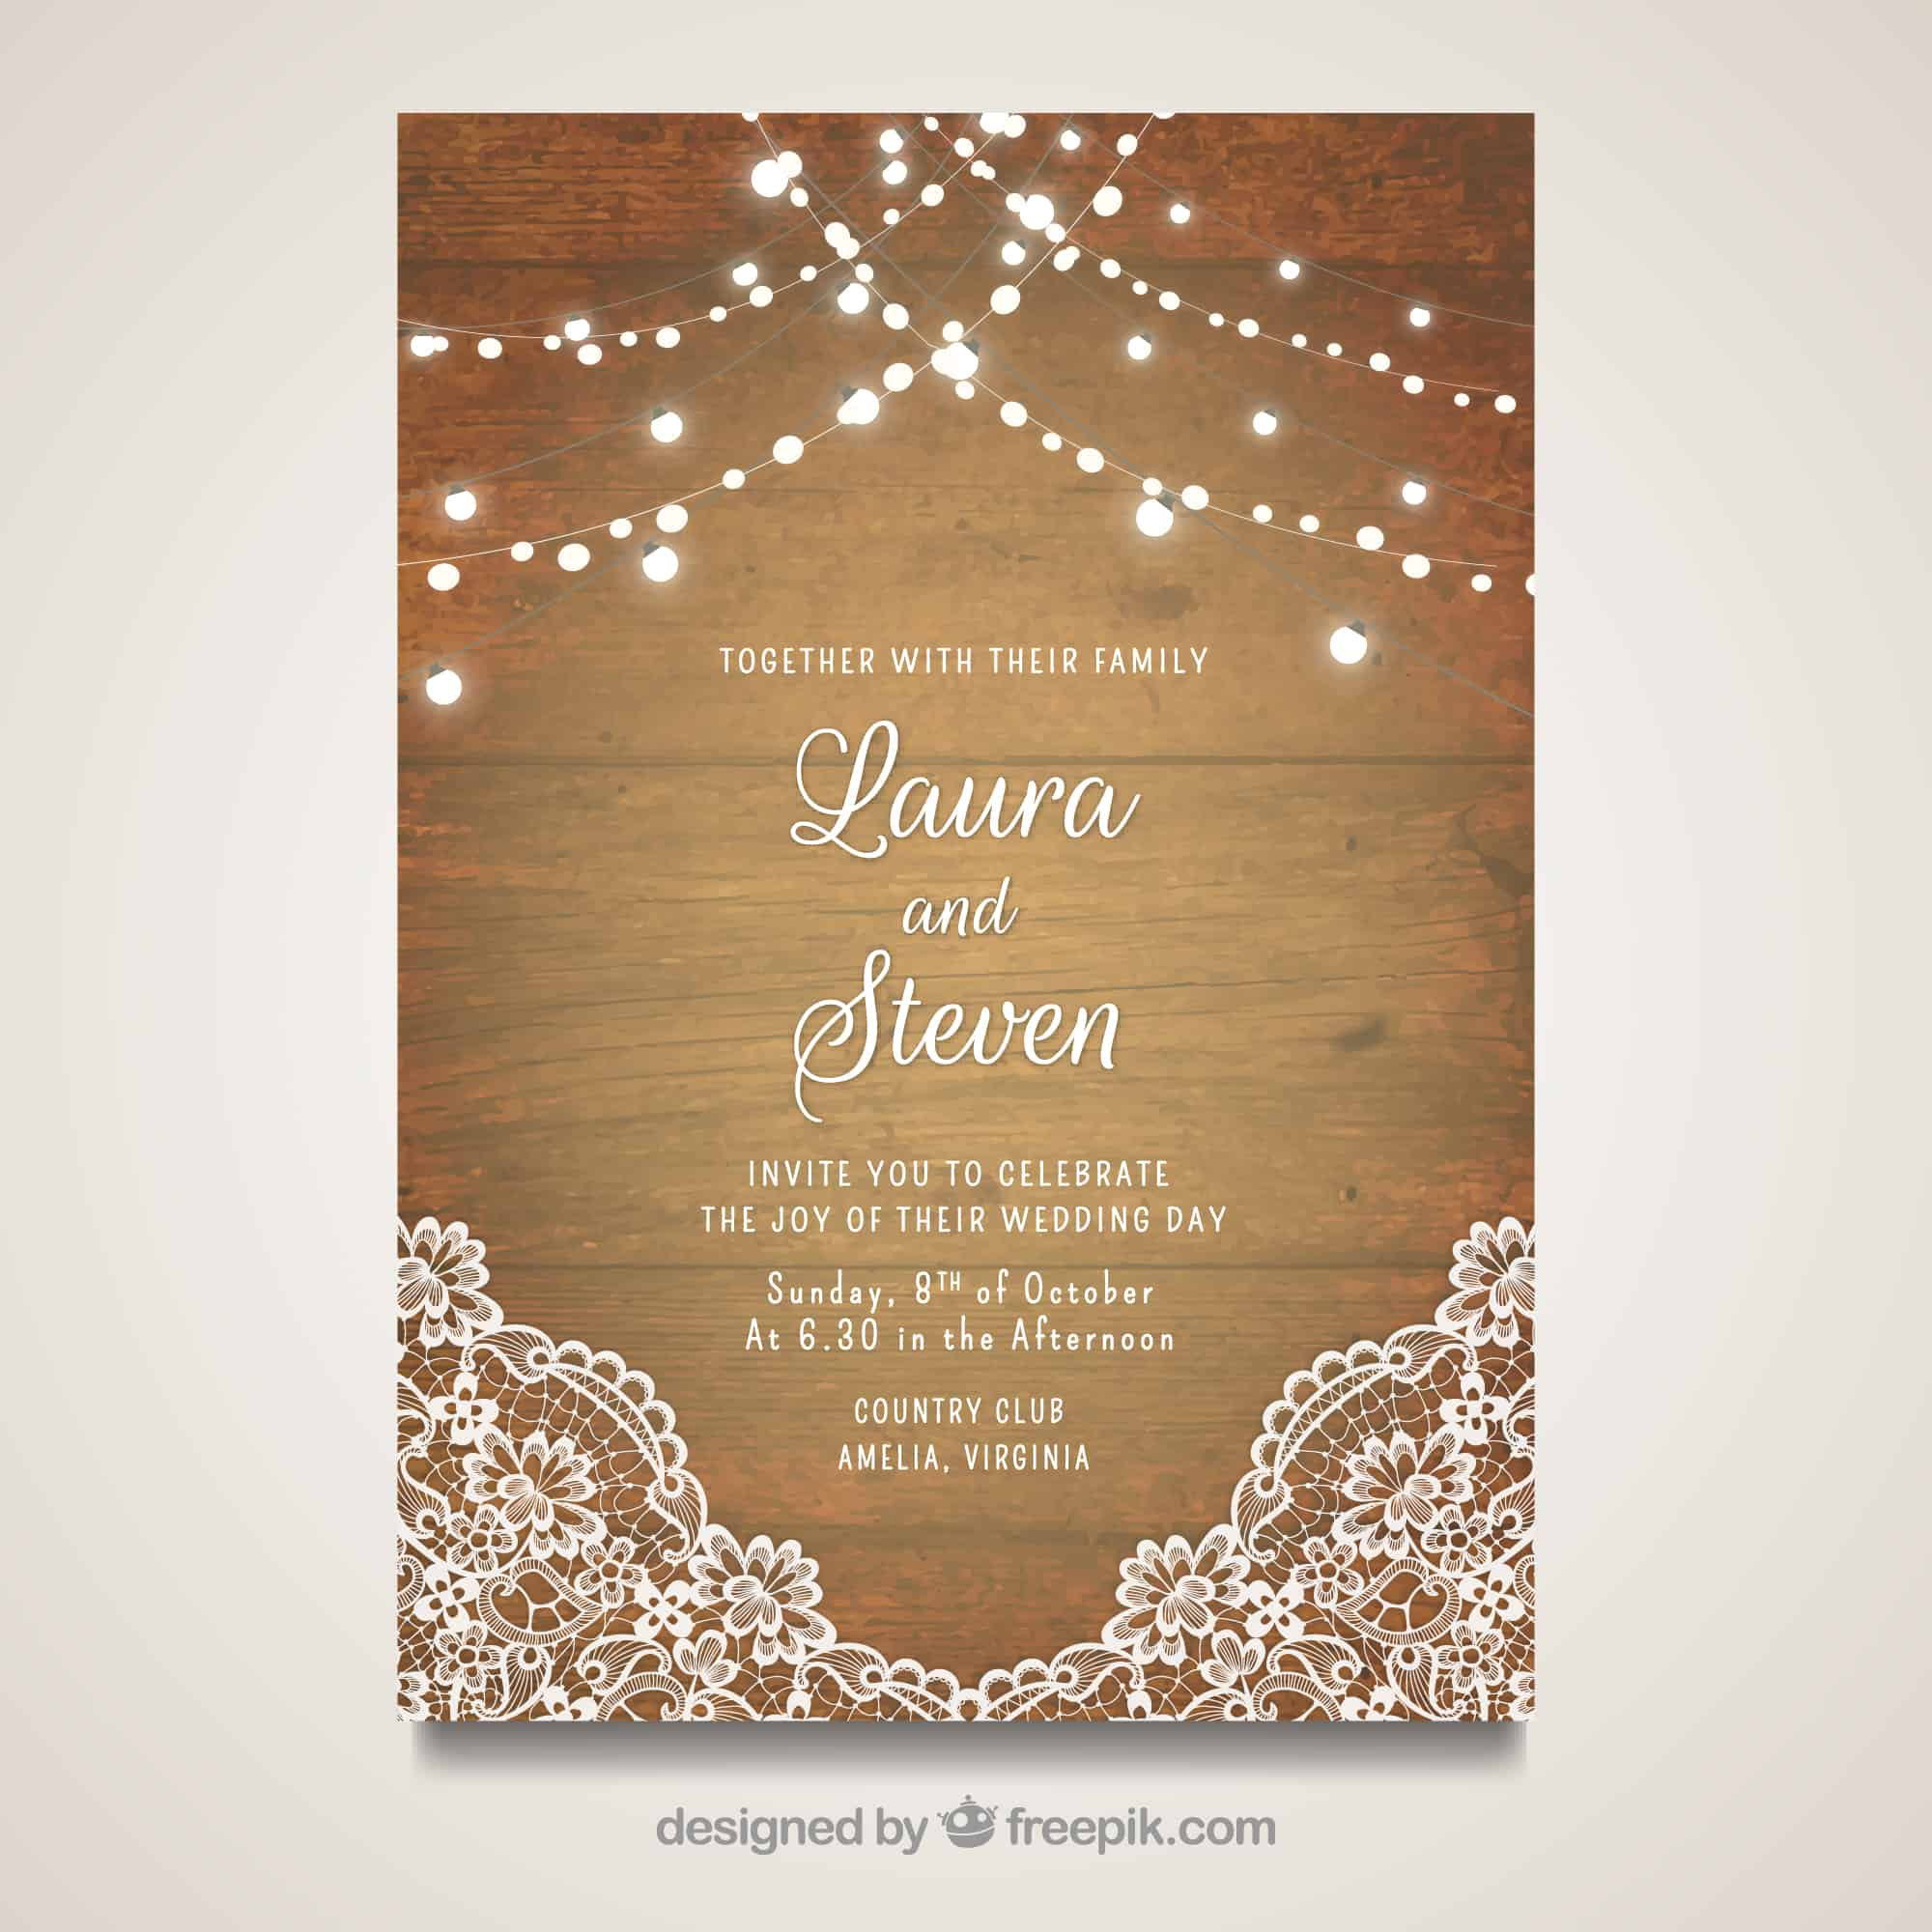 Rustic Lace - Wedding Invitation